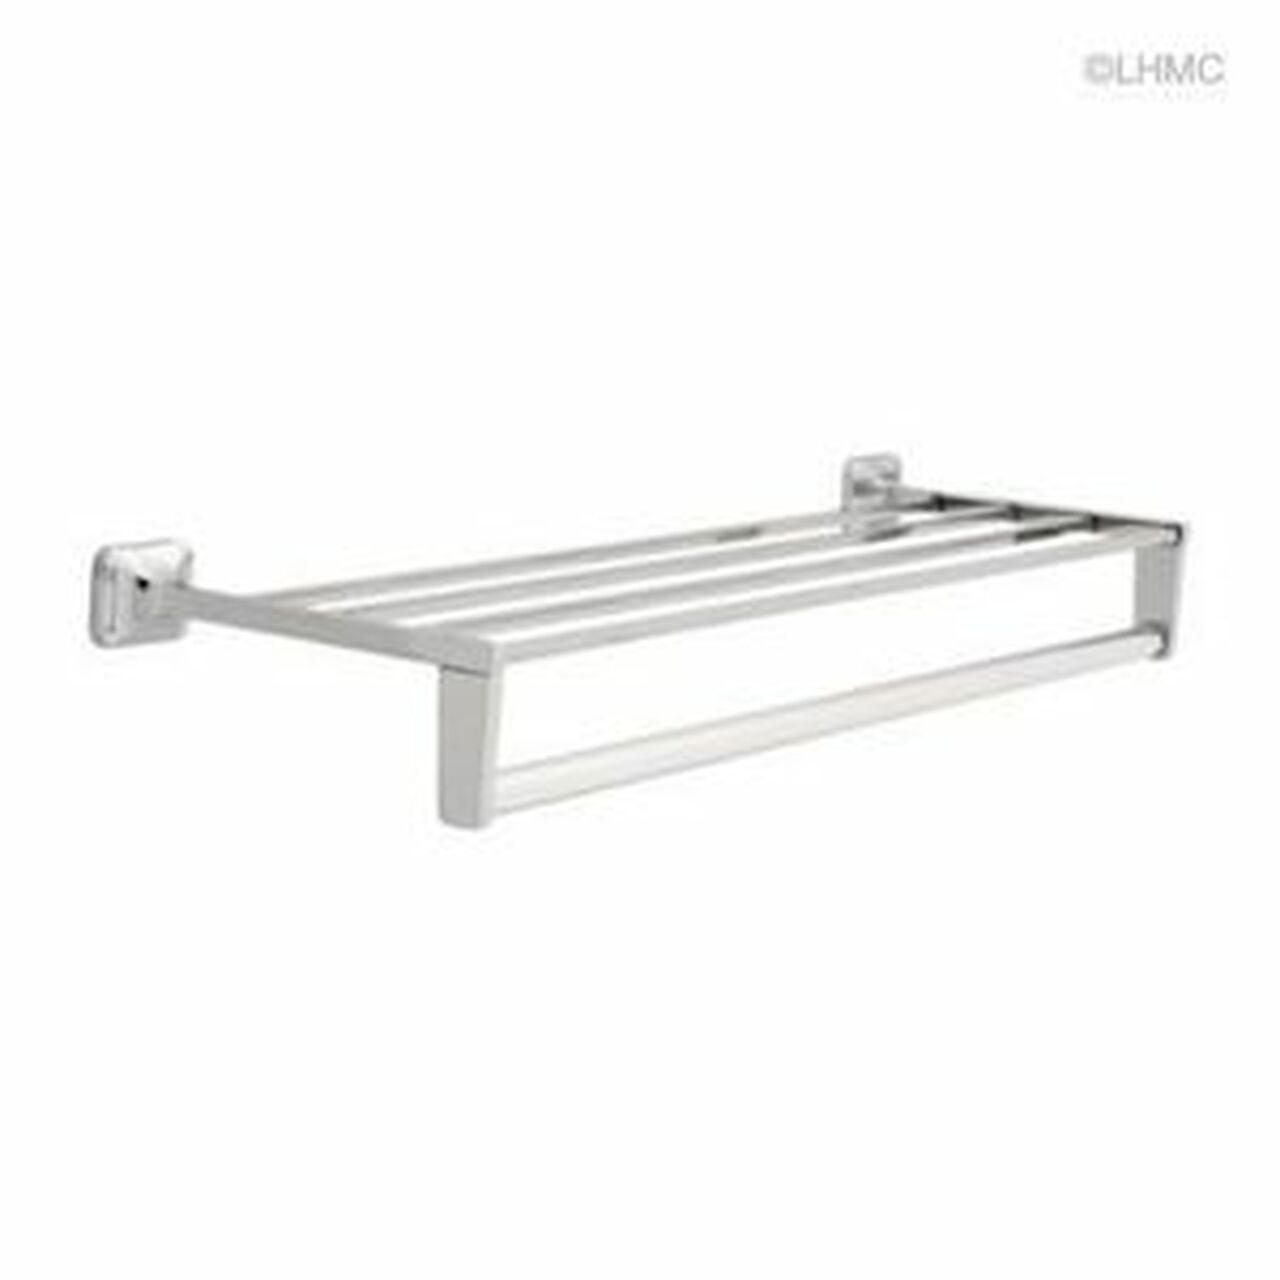 "13274 24"" Towel Shelf w/ Bar & Support Braces Chrome"